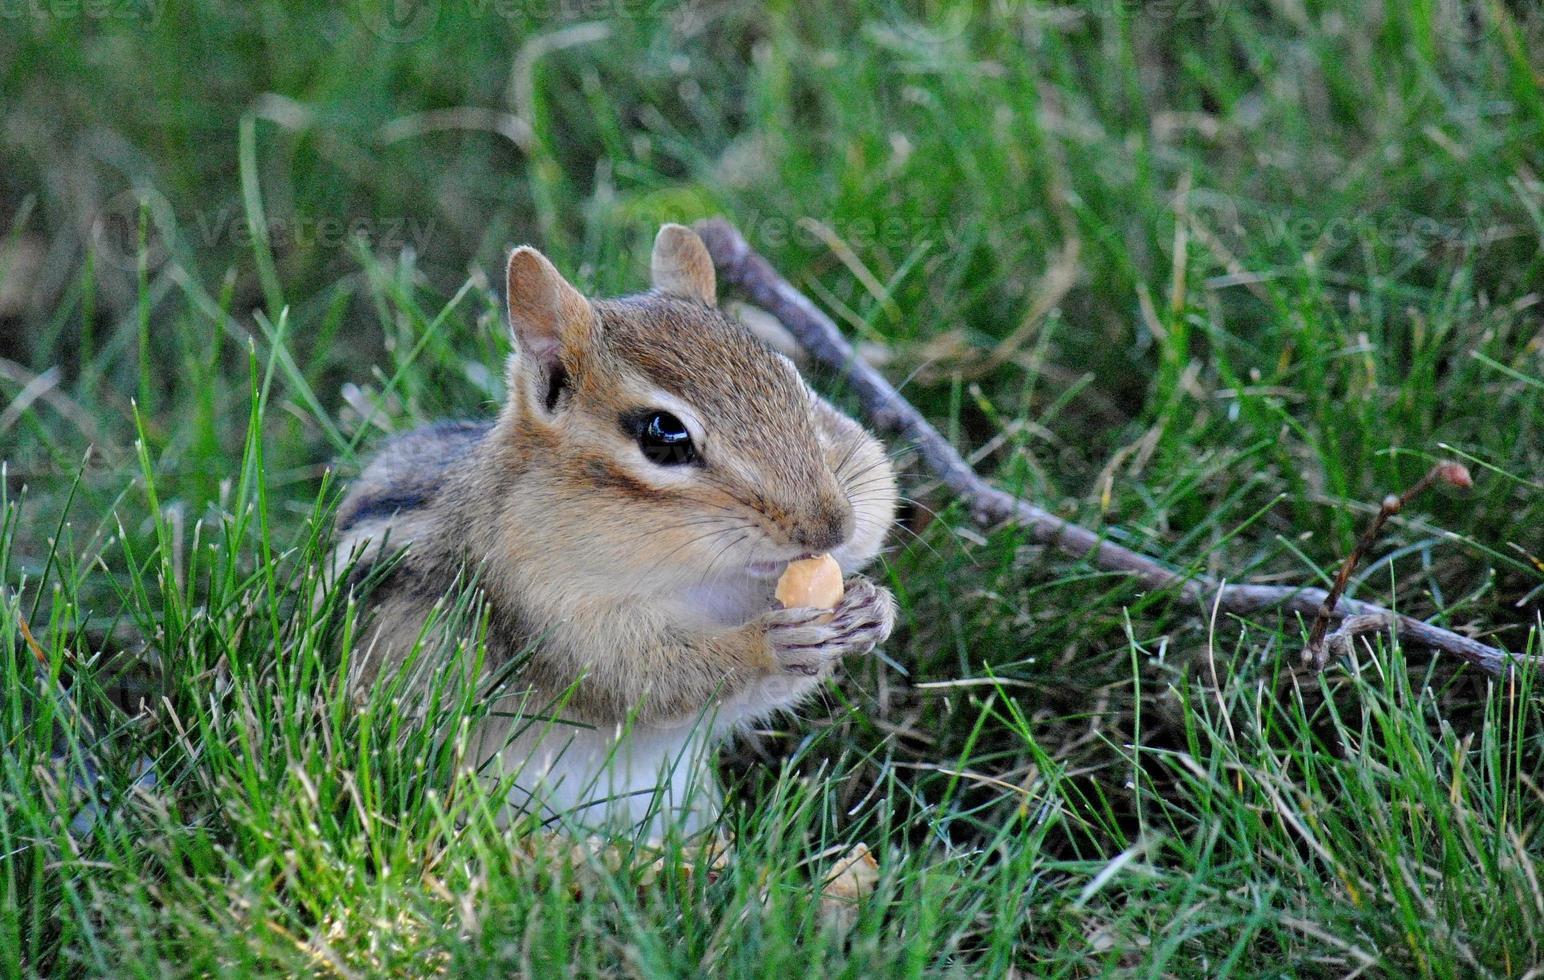 Satisfaction - Chipmunk Feeding photo